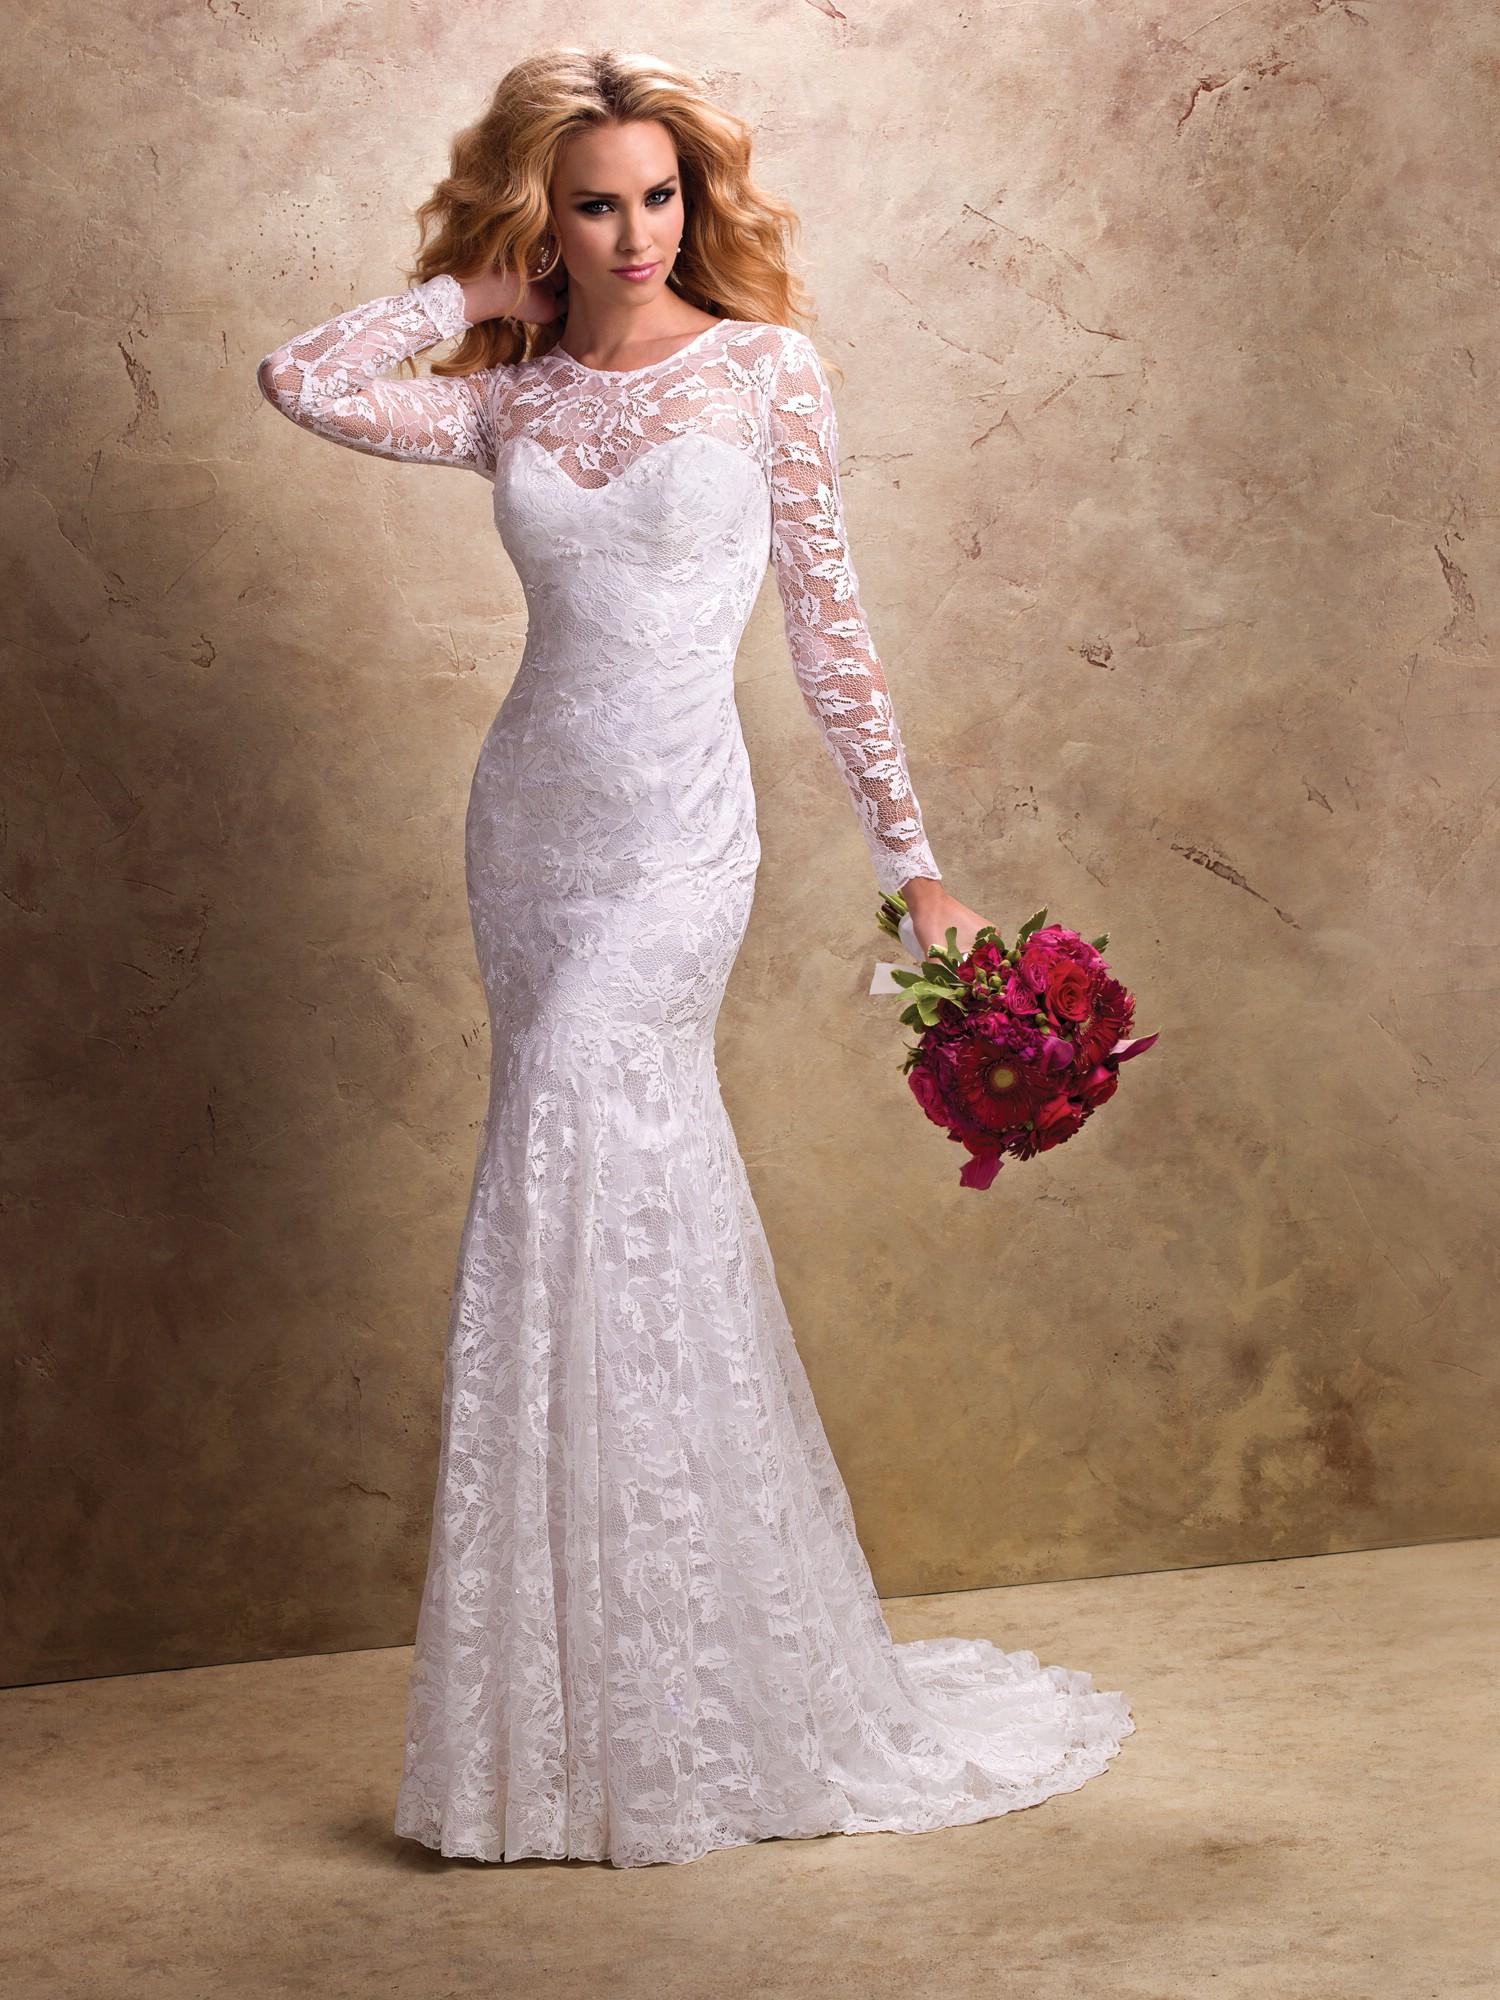 top ten wedding dresses best wedding dresses Runway Fashion Top 10 Wedding Dress Trends The best wedding dress trends See our top 10 wedding dress trends on TheKnot com